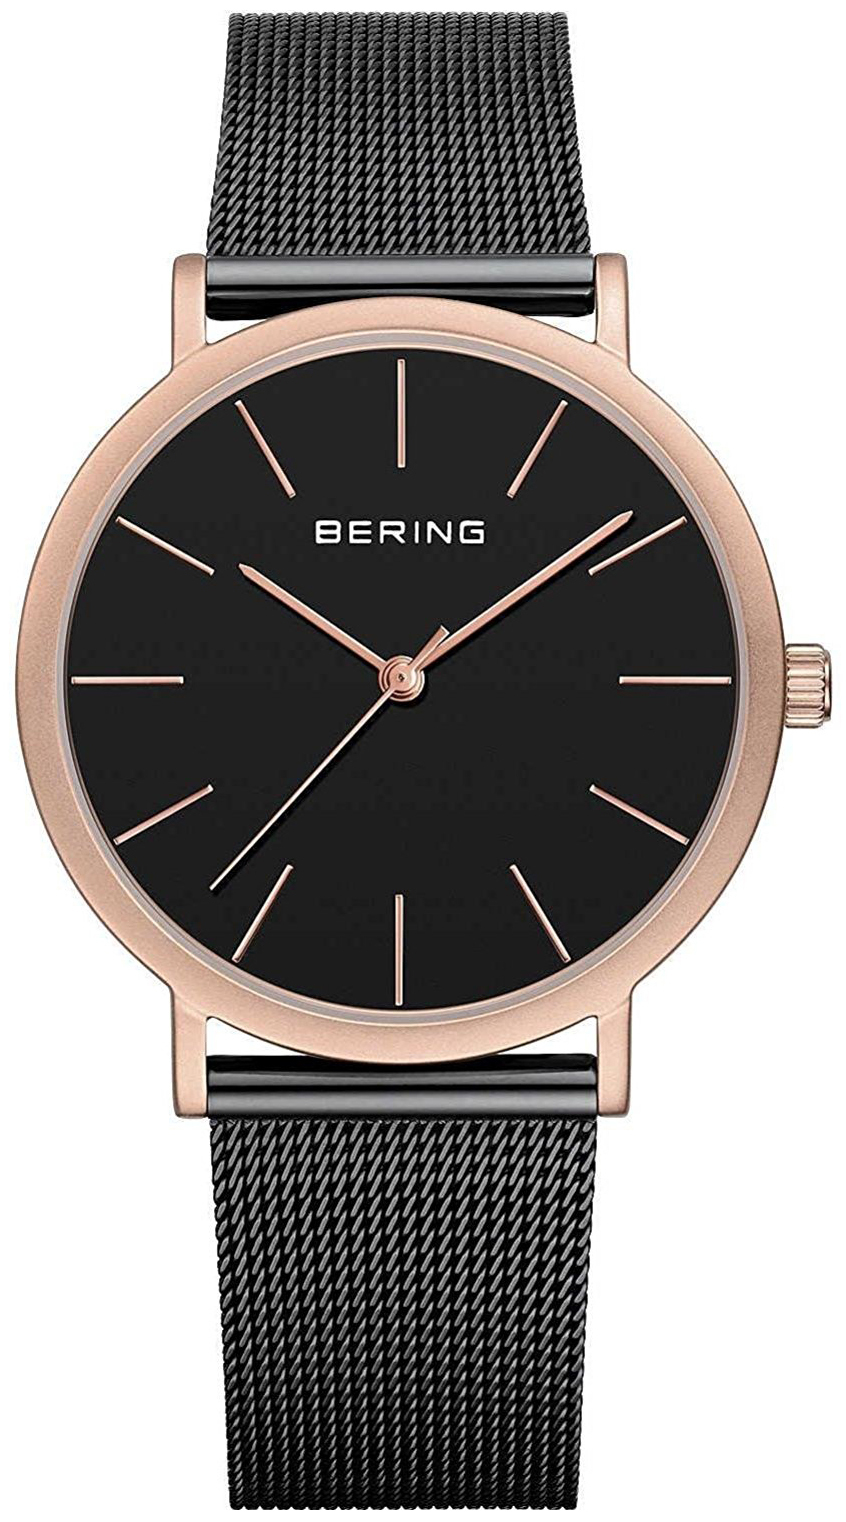 Bering Classic 13436-166 Sort/Stål Ø36 mm - Bering